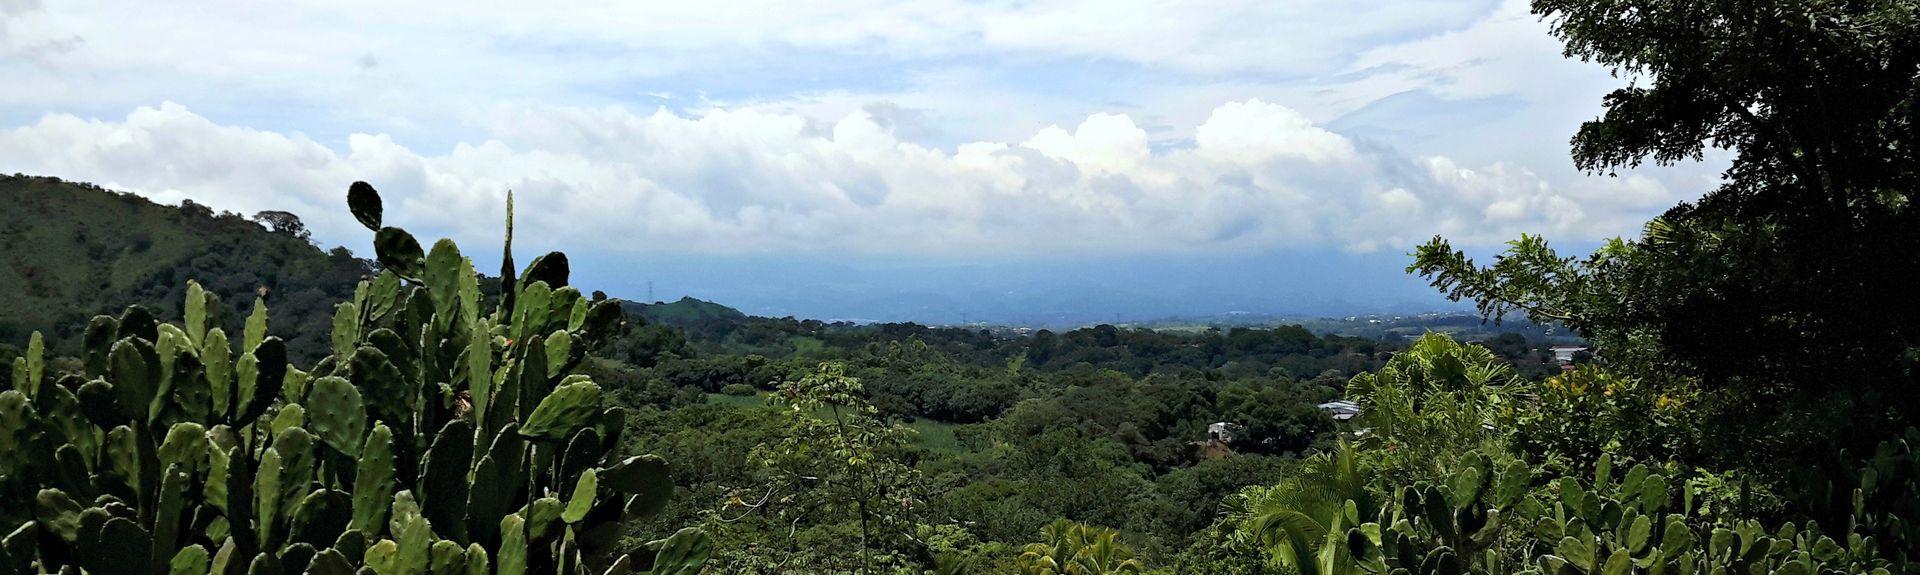 Ángeles Sur, Provinz Alajuela, Costa Rica